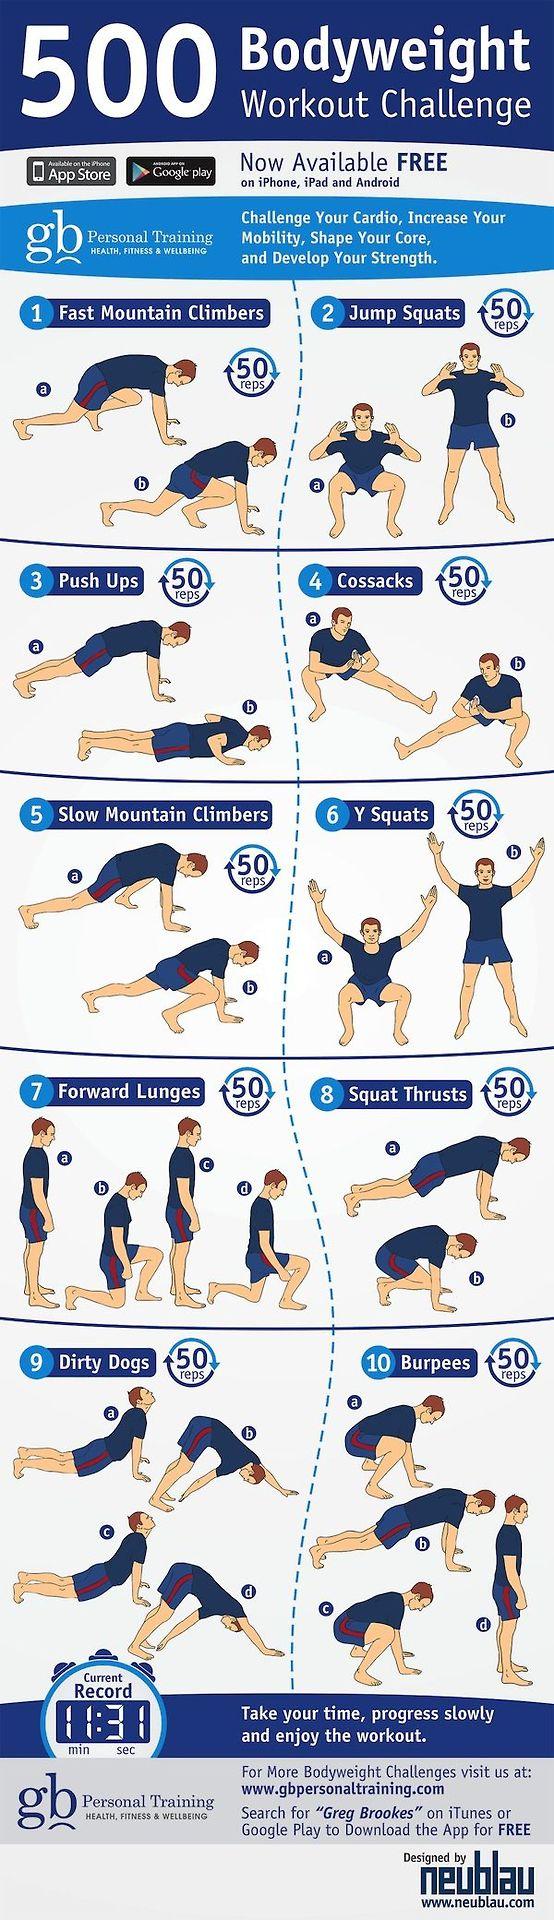 Bodyweight Fitness Pinterest Workout Street workout and